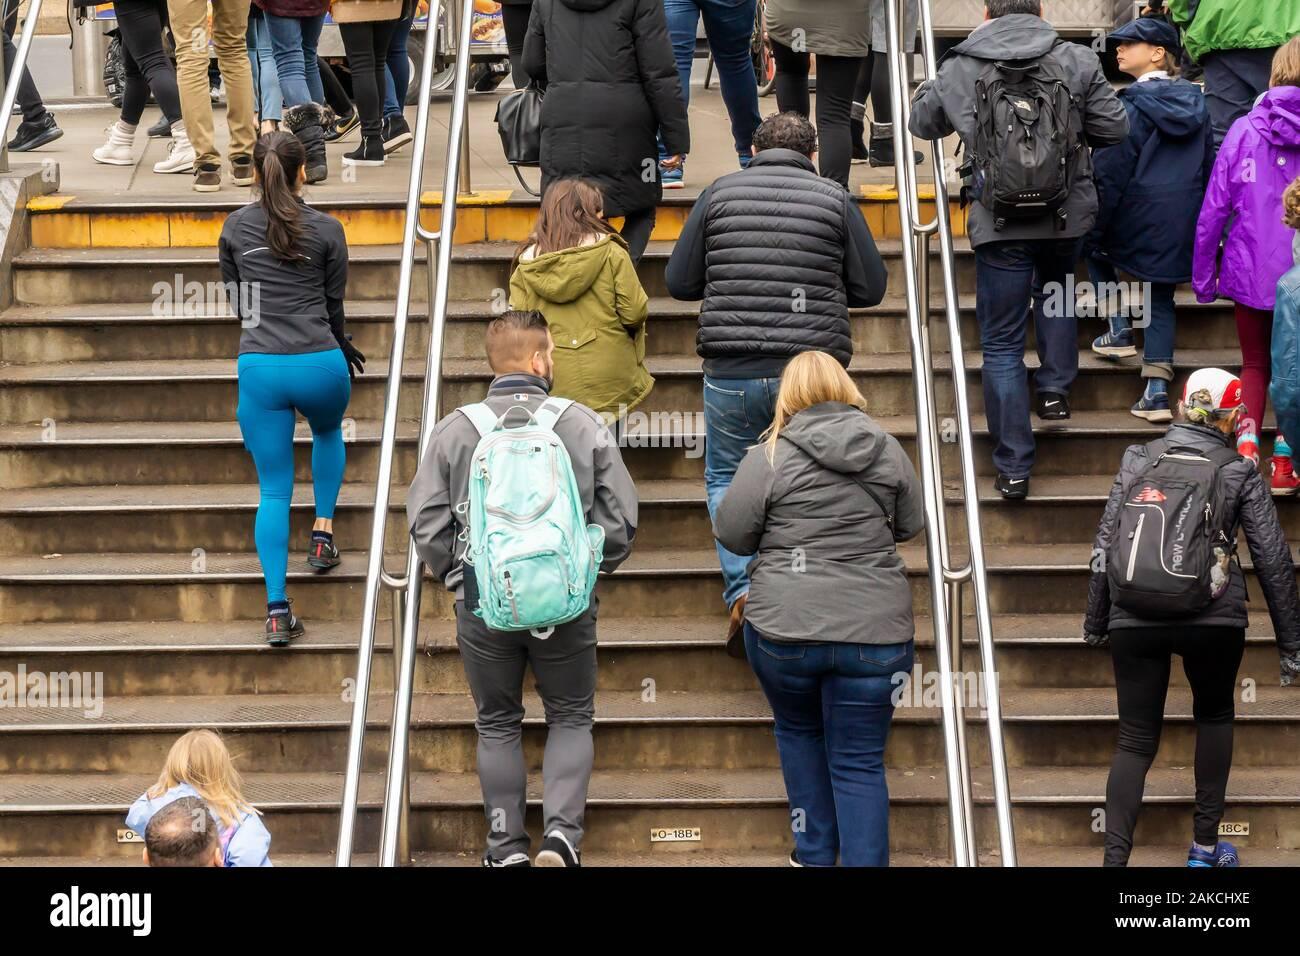 Crowds leave the subway at Columbus Circle New York on Sunday, December 29, 2019. (© Richard B. Levine) Stock Photo